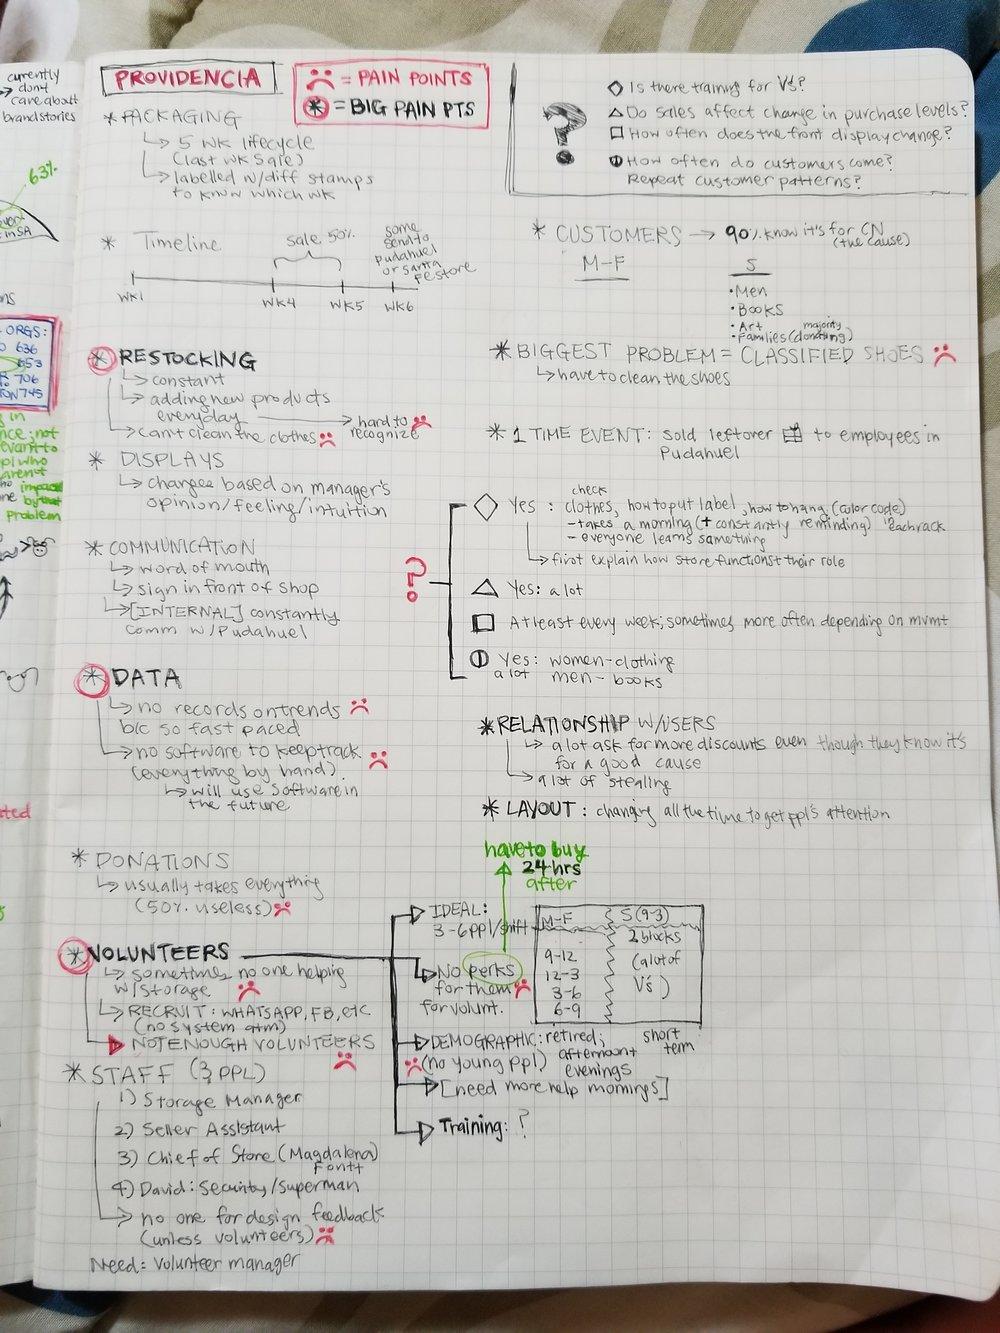 Providencia Notes.jpg